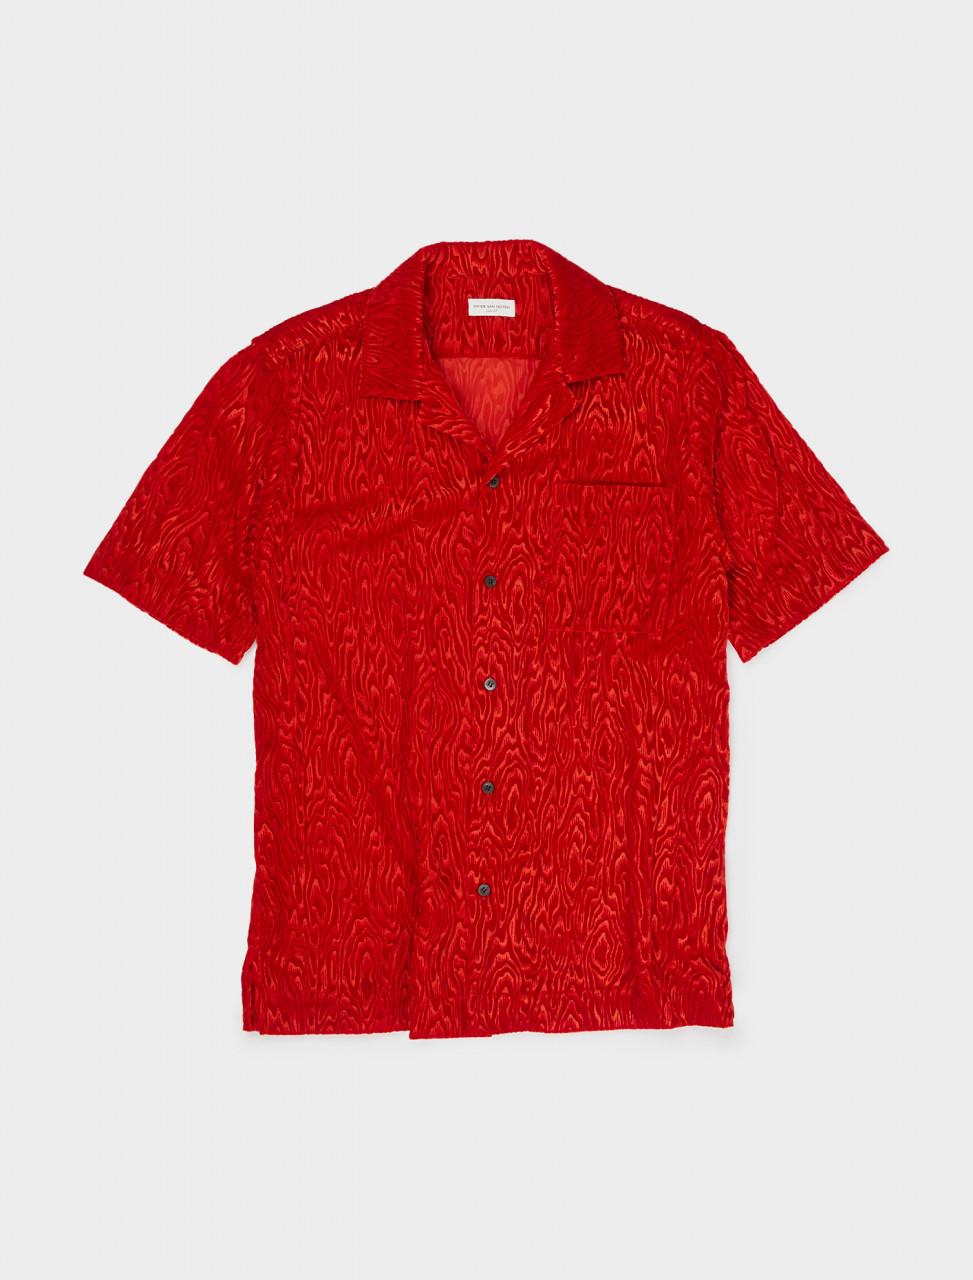 260-202-20718-1254-352 DRIES VAN NOTEN CARLTONE SHIRT RED